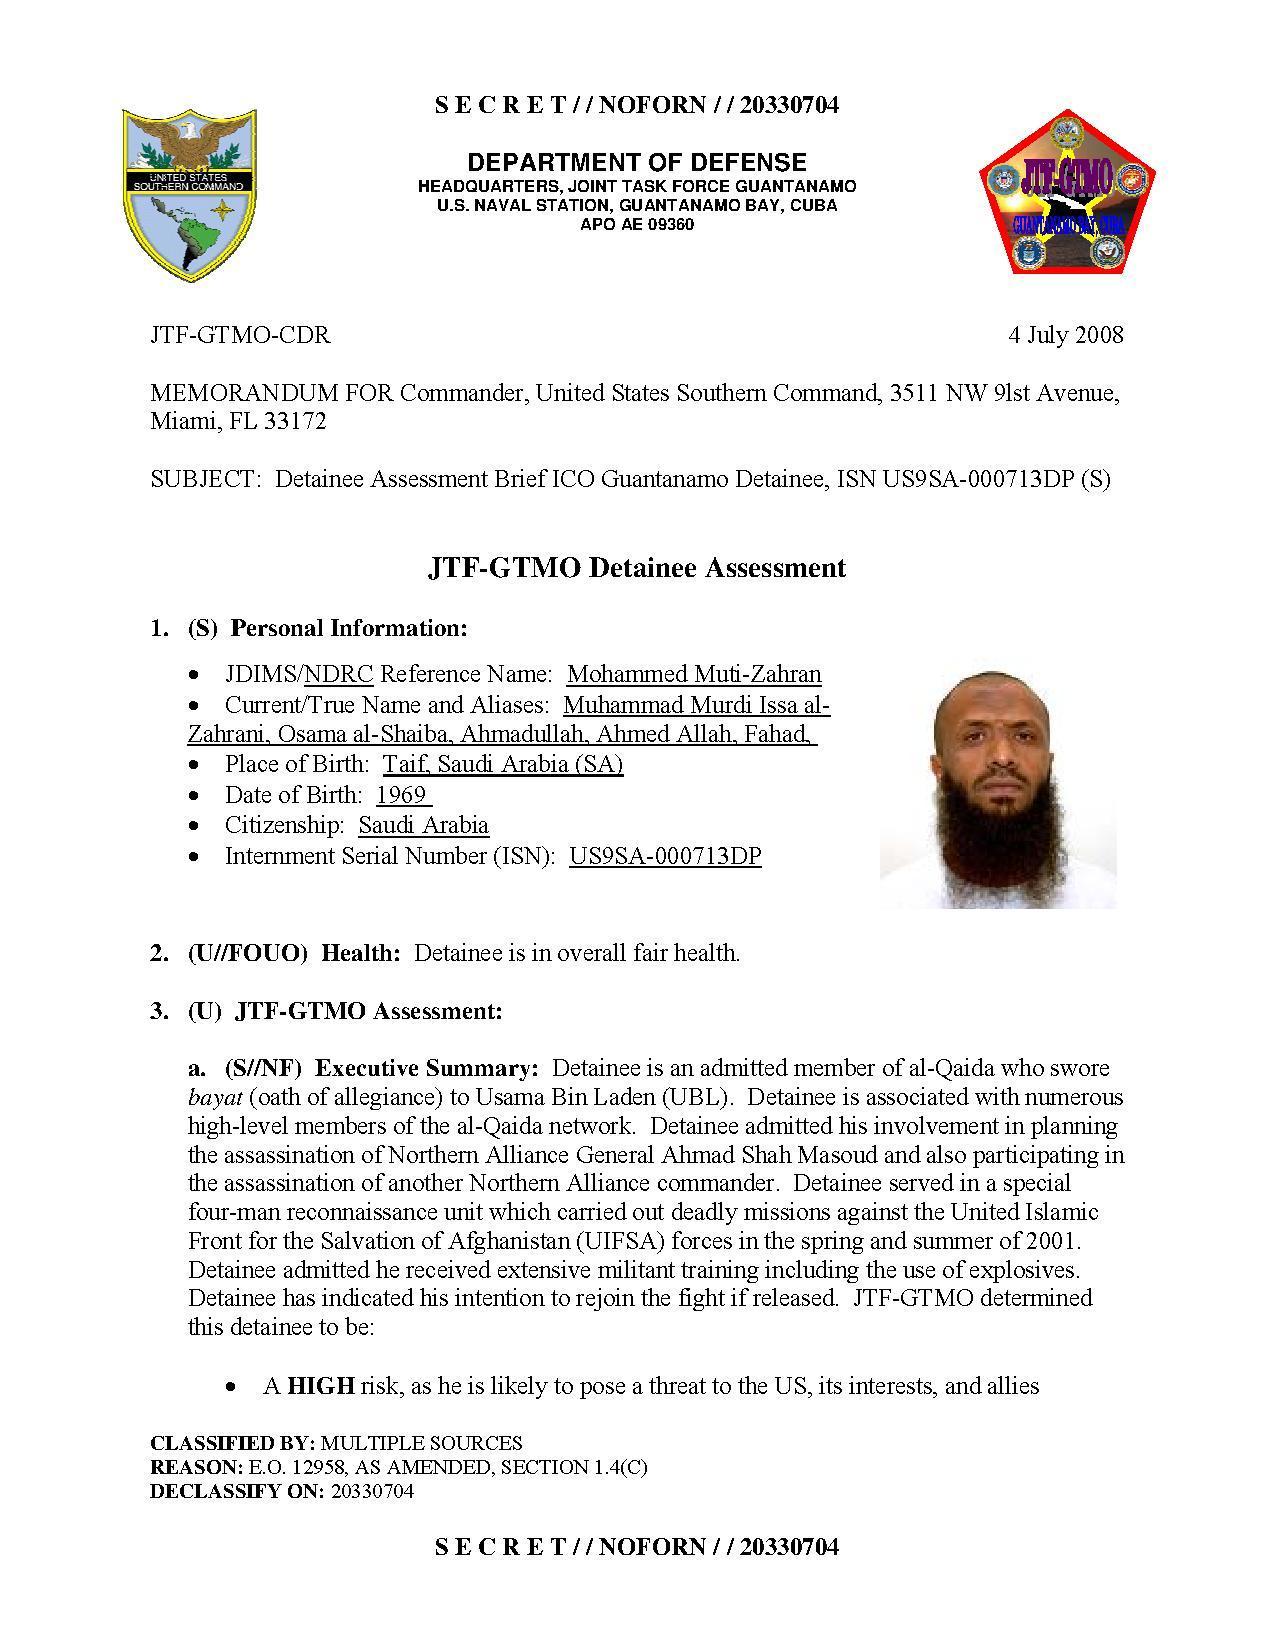 ISN 00713, Mohammed Muti-Zahran's Guantanamo detainee assessment.pdf